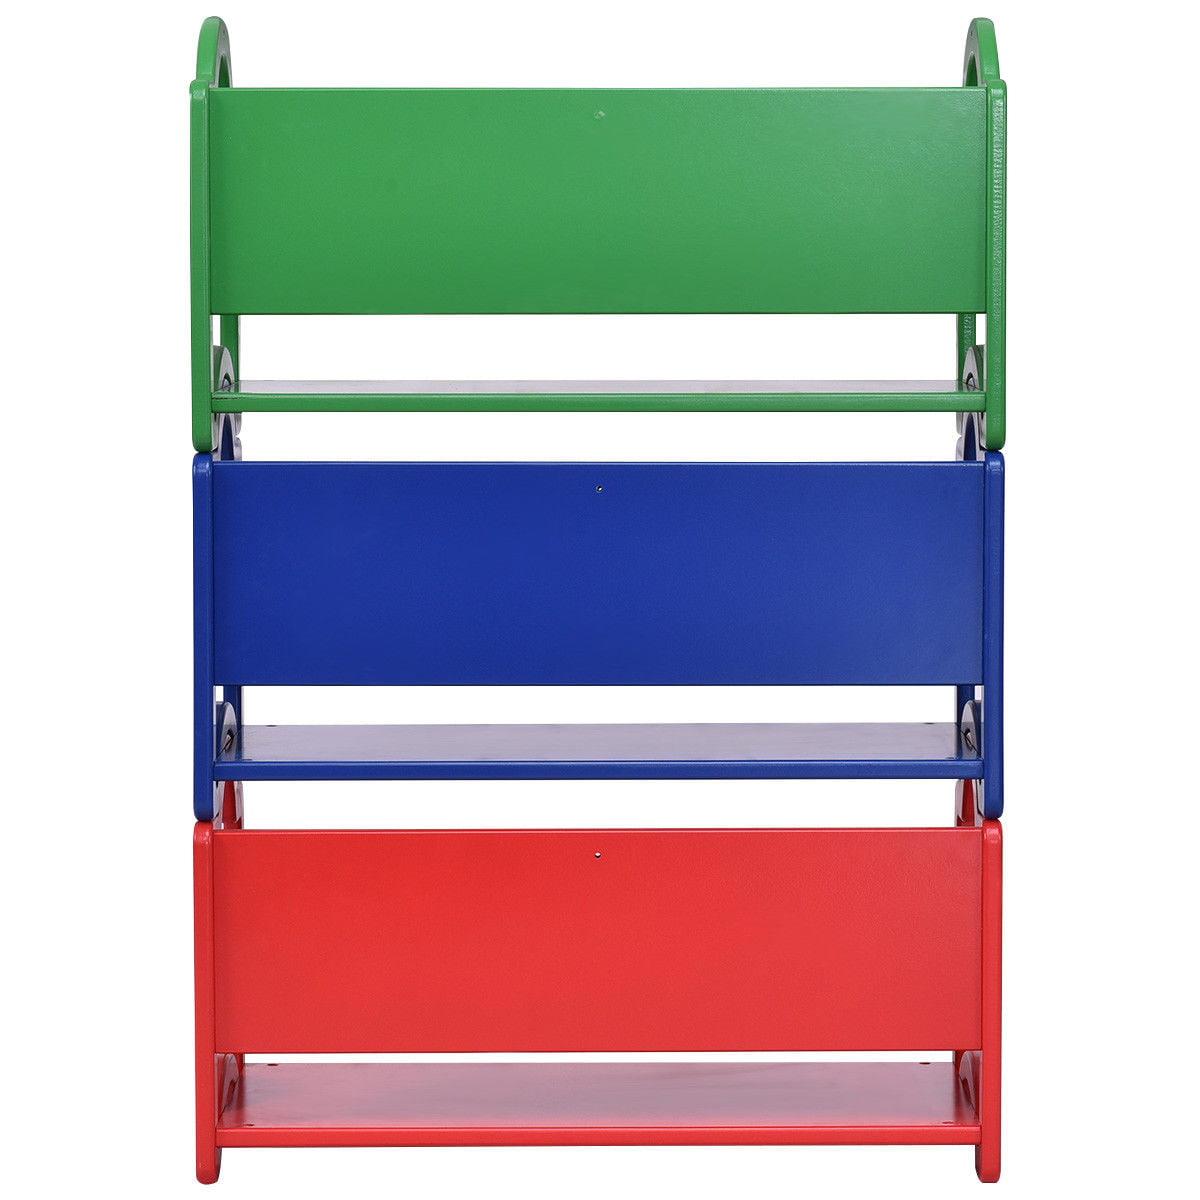 Gymax Kids Book Shelf Storage Rack Organizer Bookcase Display Holder Home Furniture - image 5 of 10